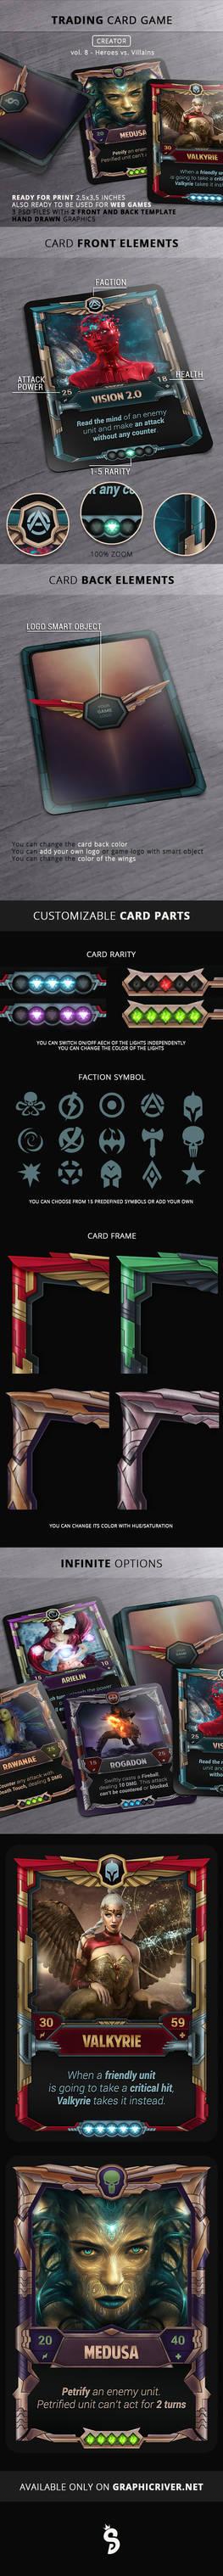 Superhero VS. Villains - TCG card template